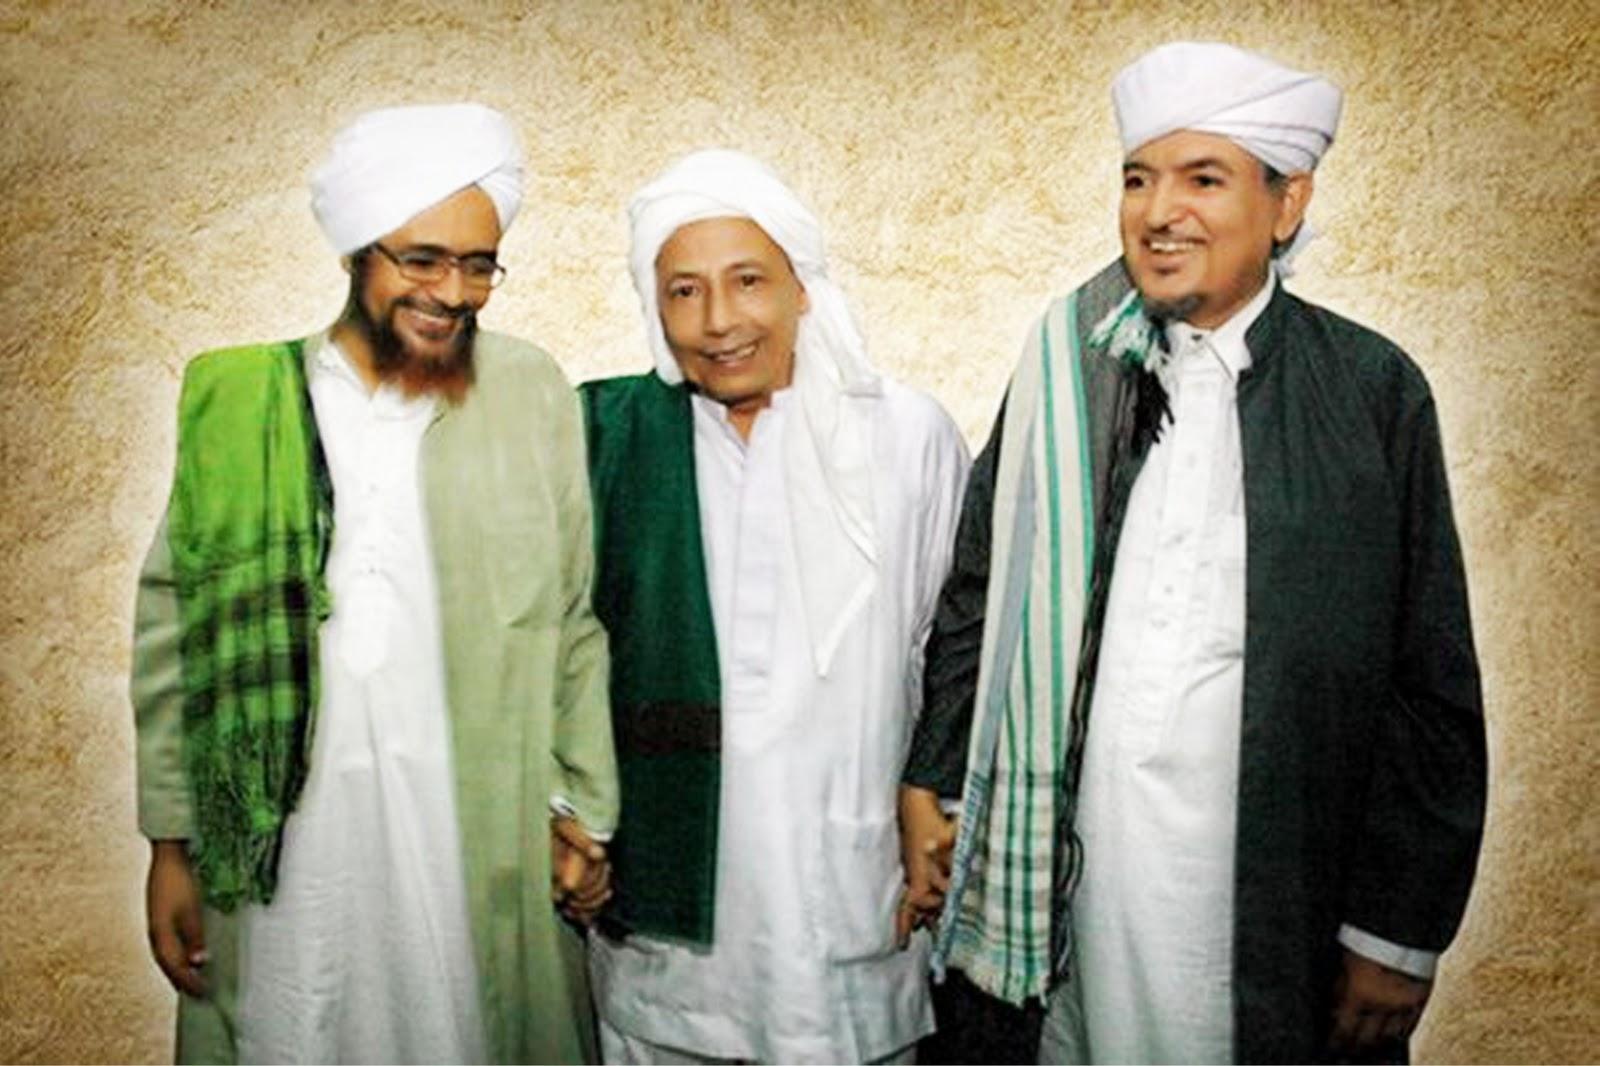 [Habib Umar bin Hafidz] Nahi Munkar itu tidak Dengan Mencaci Maki dan Provokasi Massa